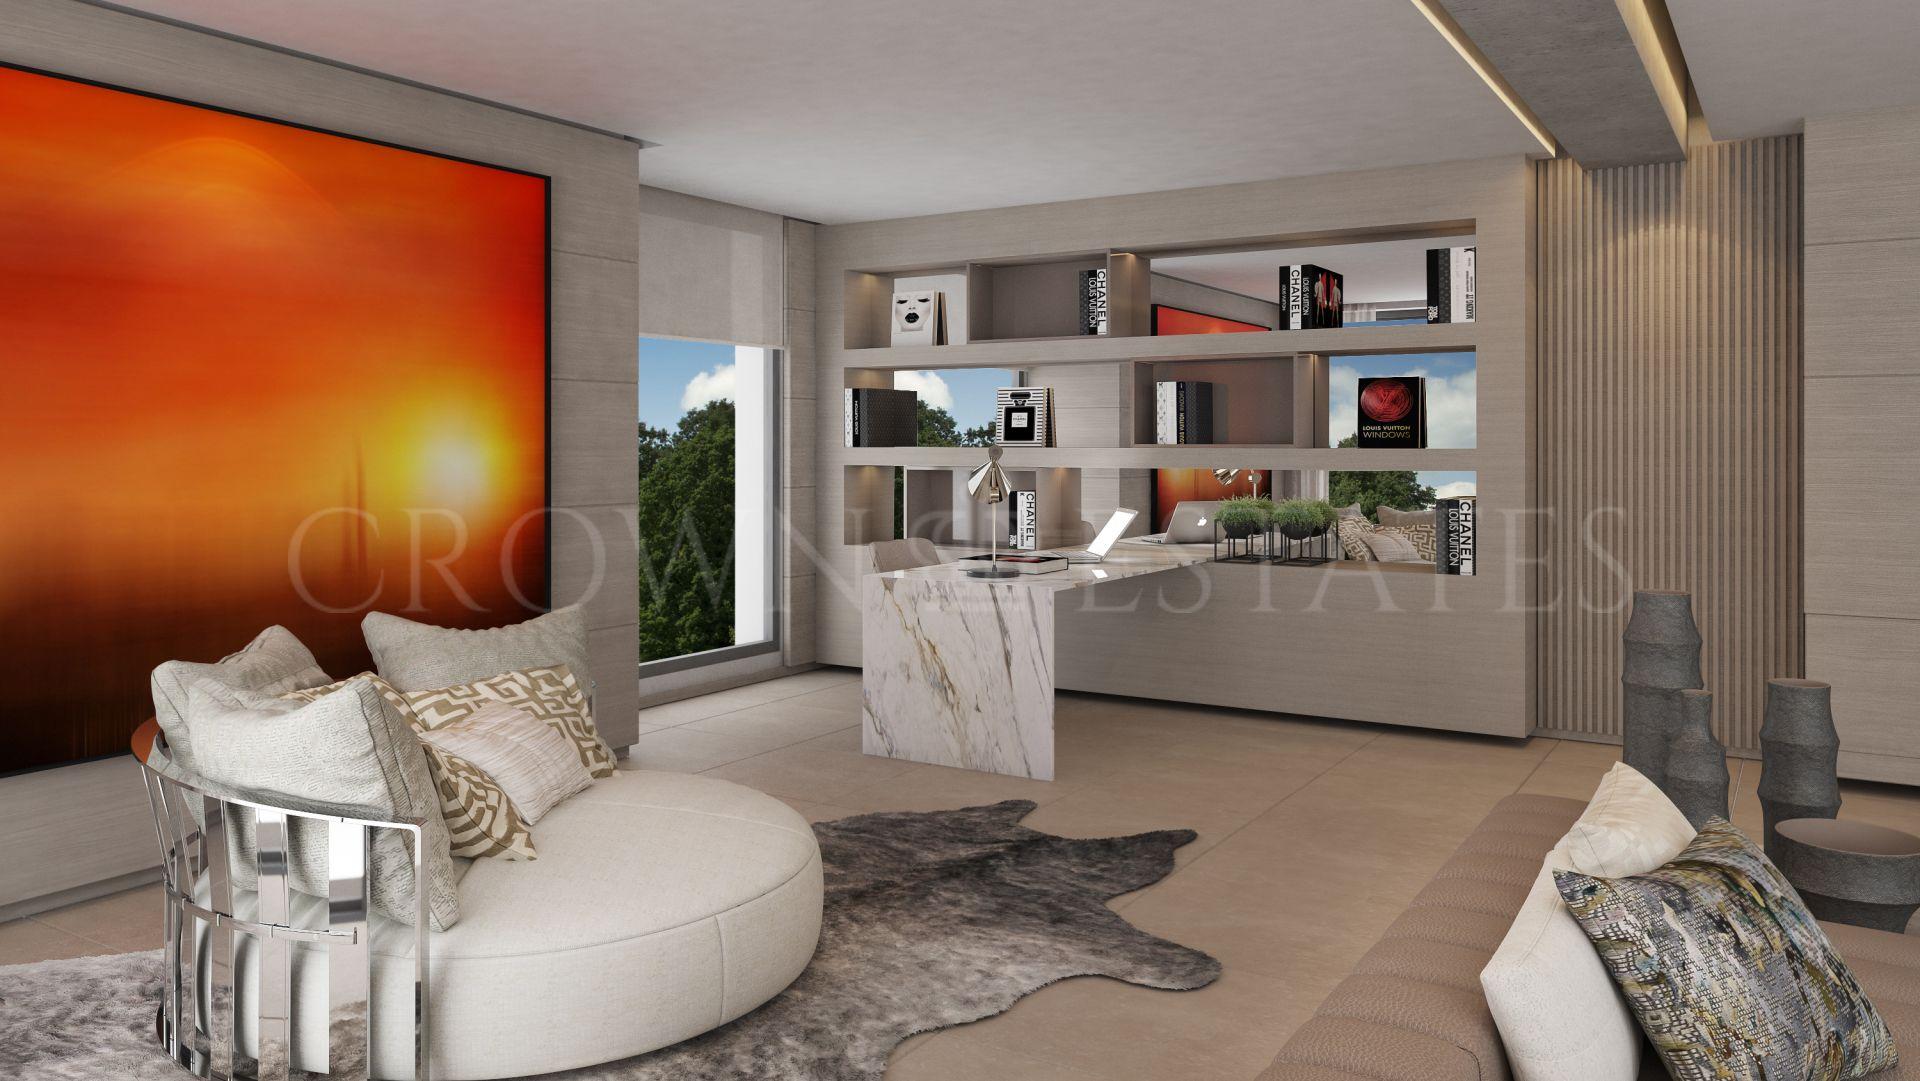 Light Blue Villas new luxury modern villas development in estepona